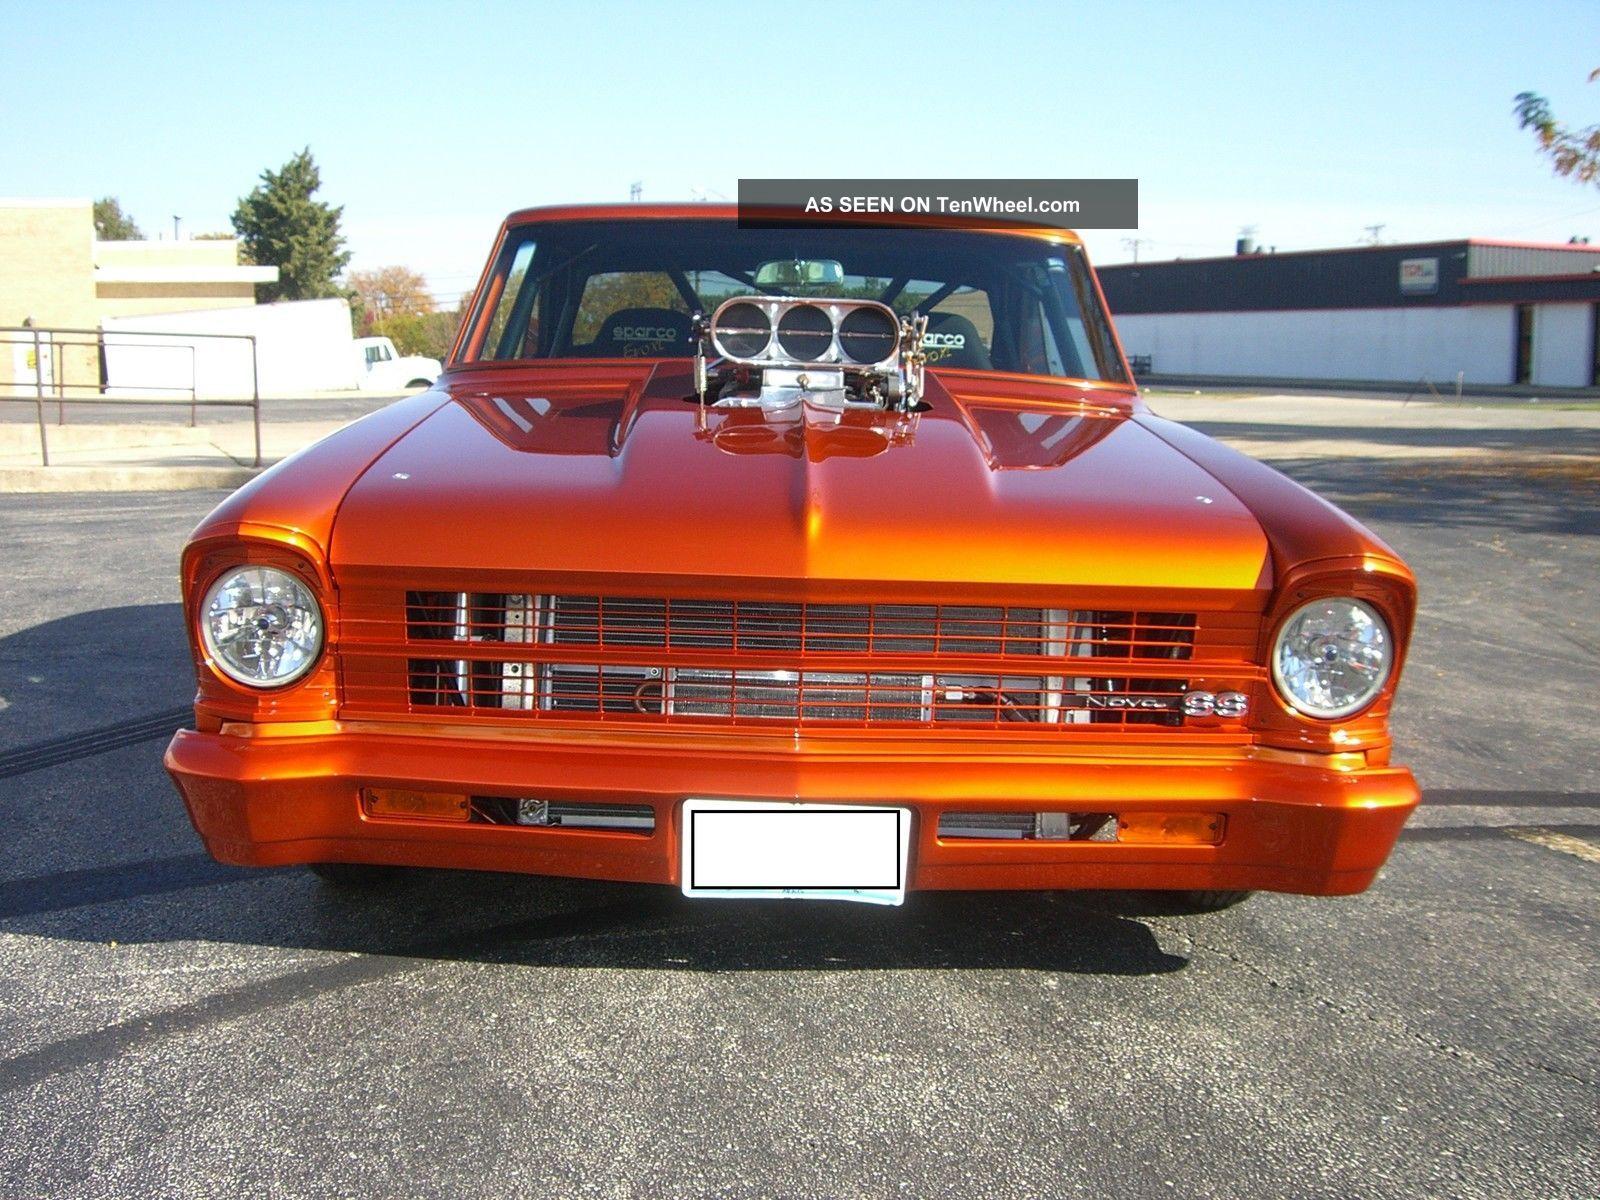 Nissan Columbus Ohio >> 1967 Chevy Nova Pro Street For Sale.html | Autos Weblog